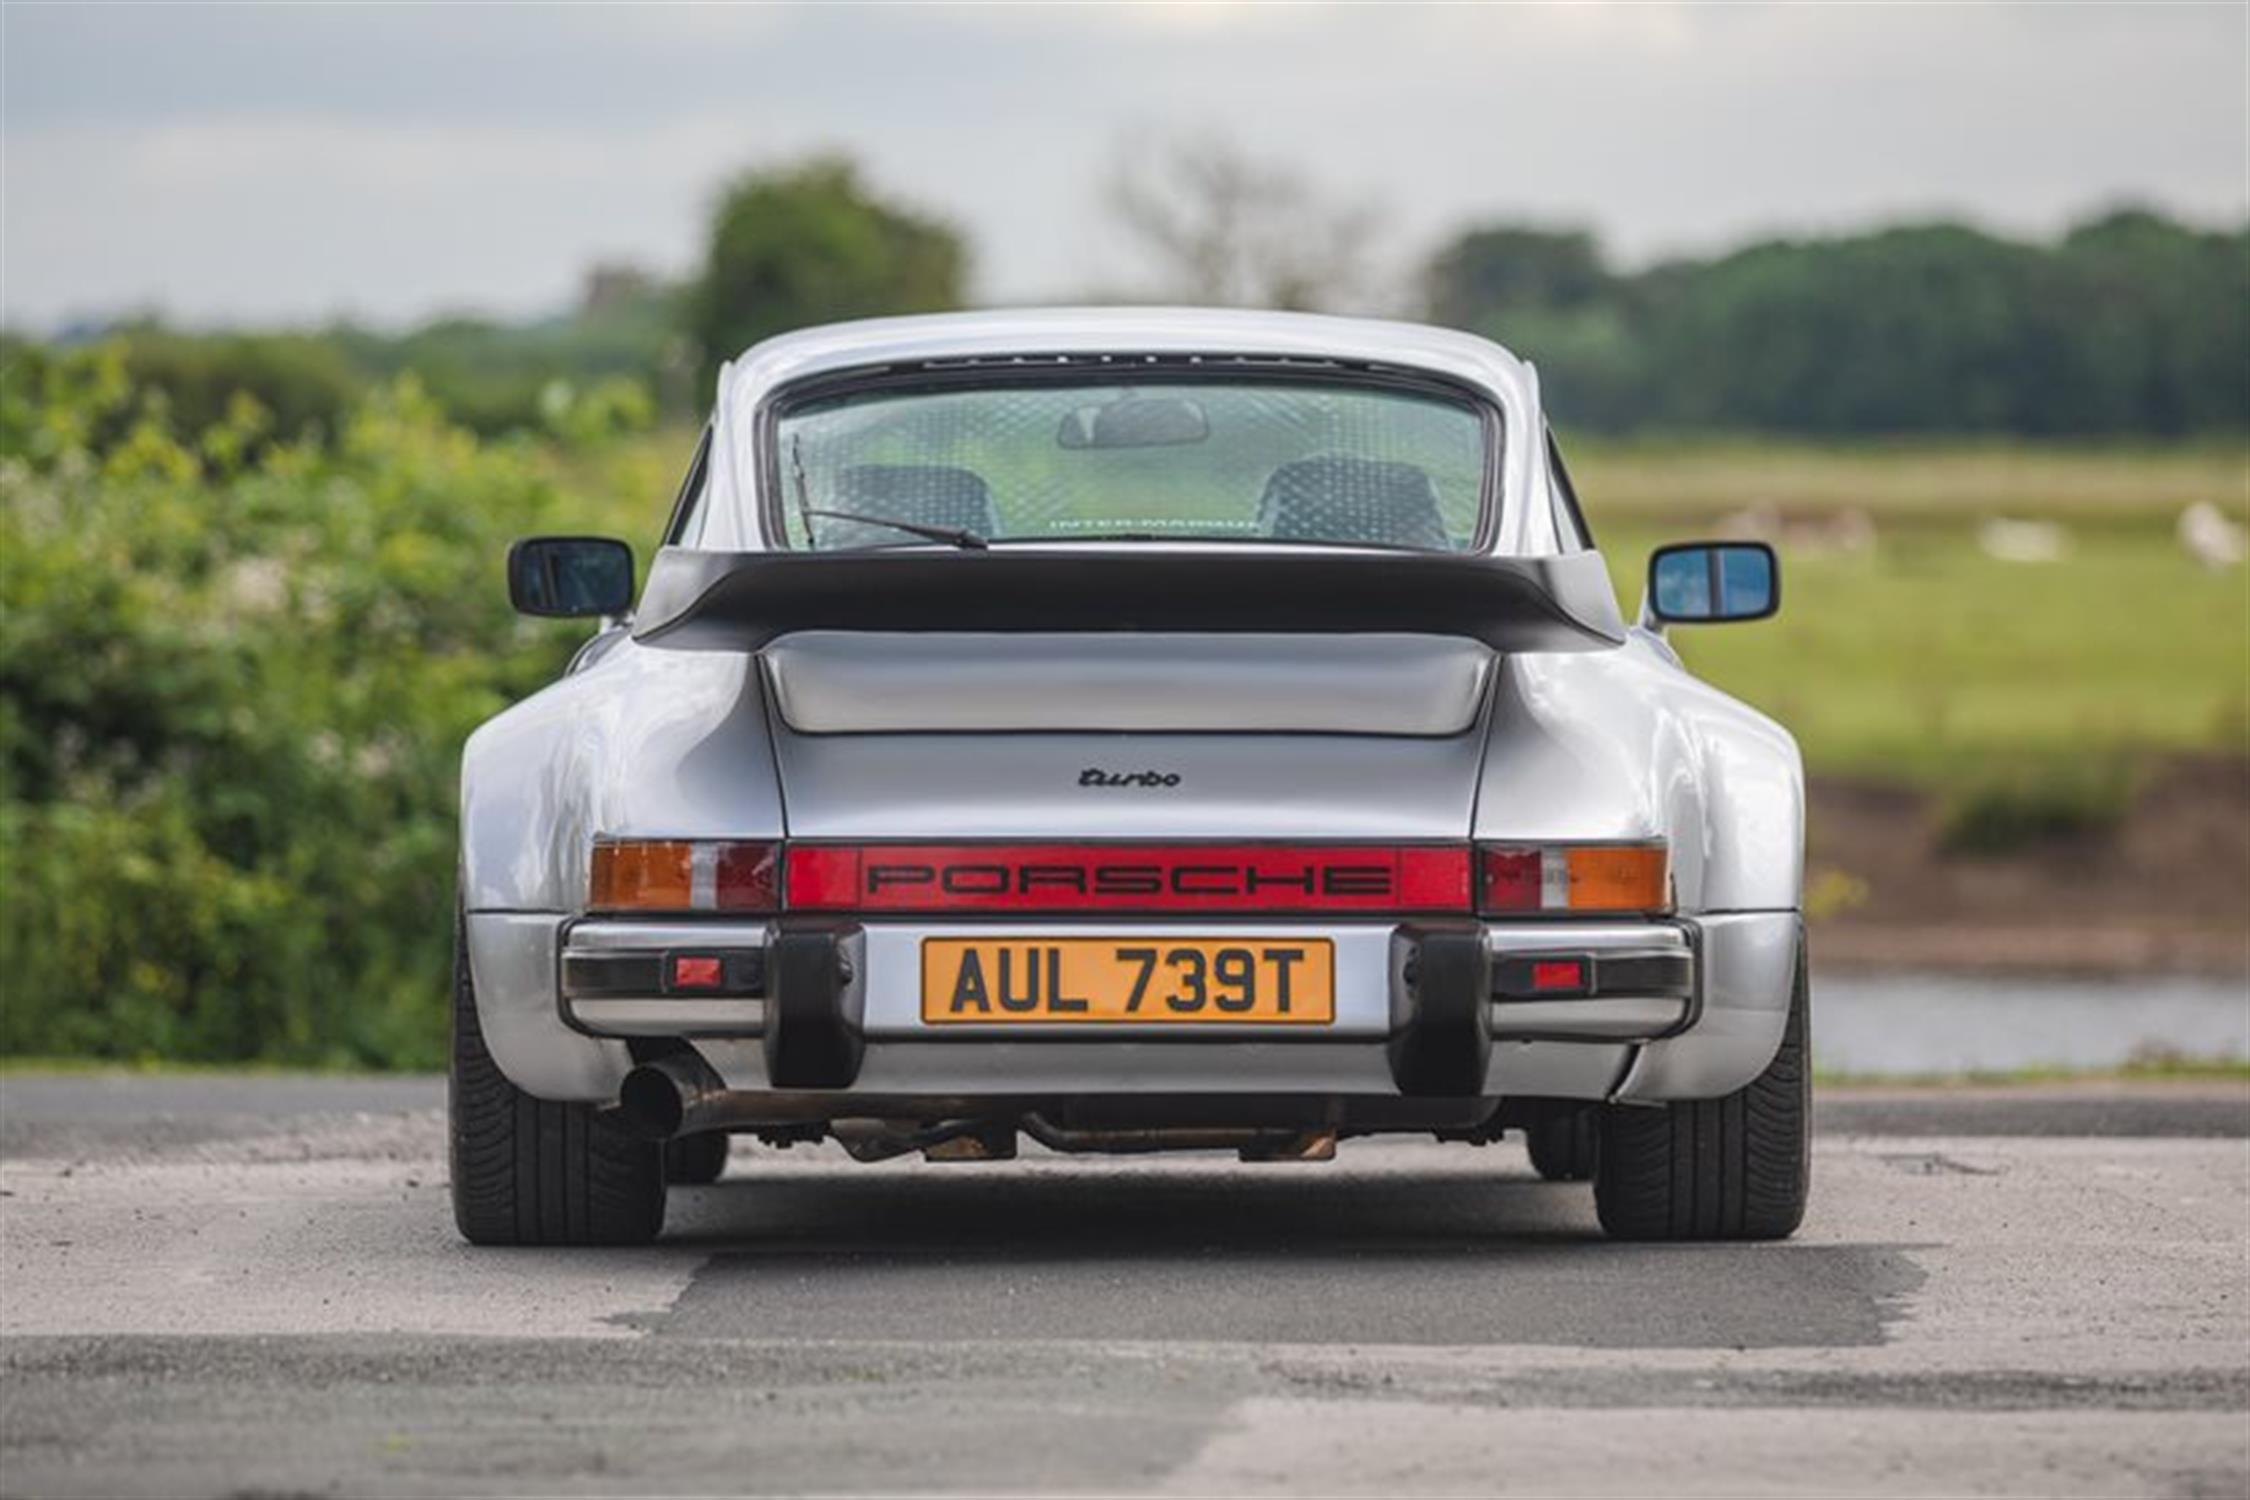 1979 Porsche 911 Turbo 3.3-Litre - Image 2 of 10